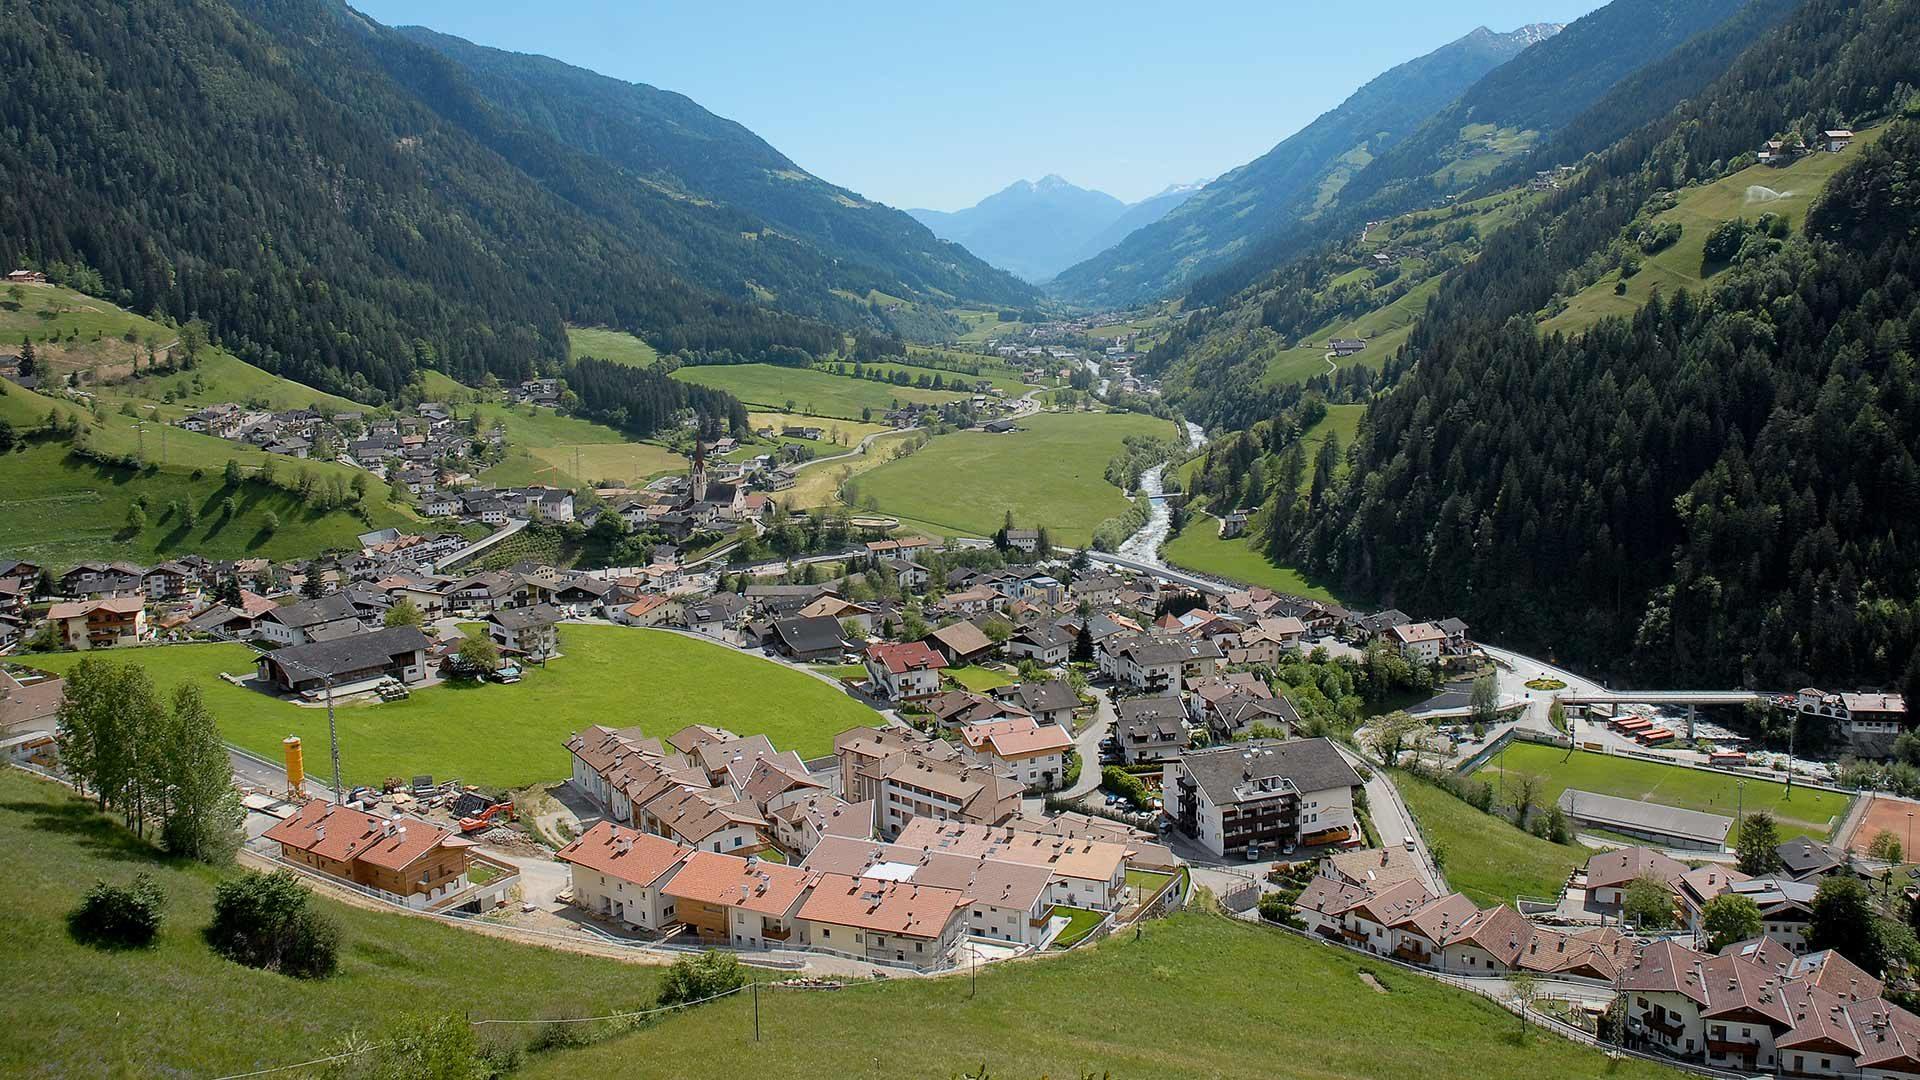 St. Leonhard in Südtirol